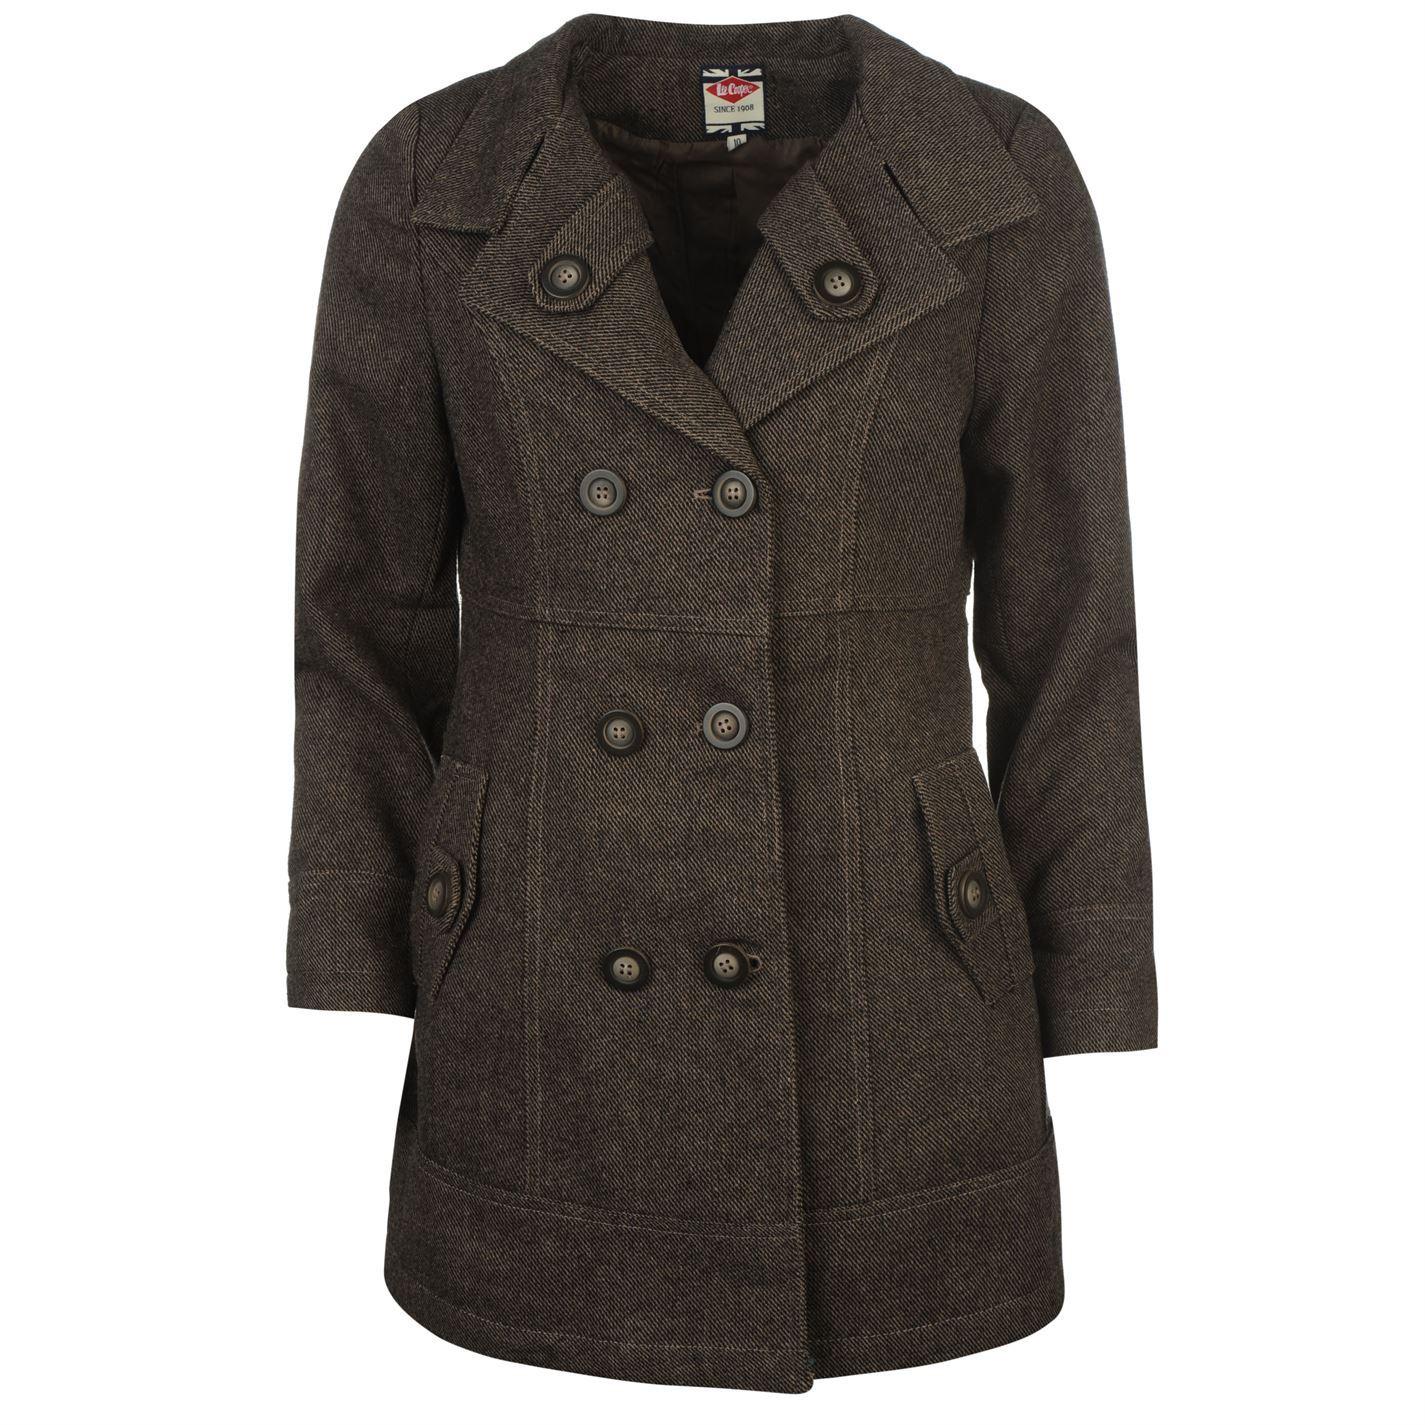 Lee Cooper Wool Coat Womens Brown Jacket Coat U0026 Jackets Outerwear | EBay